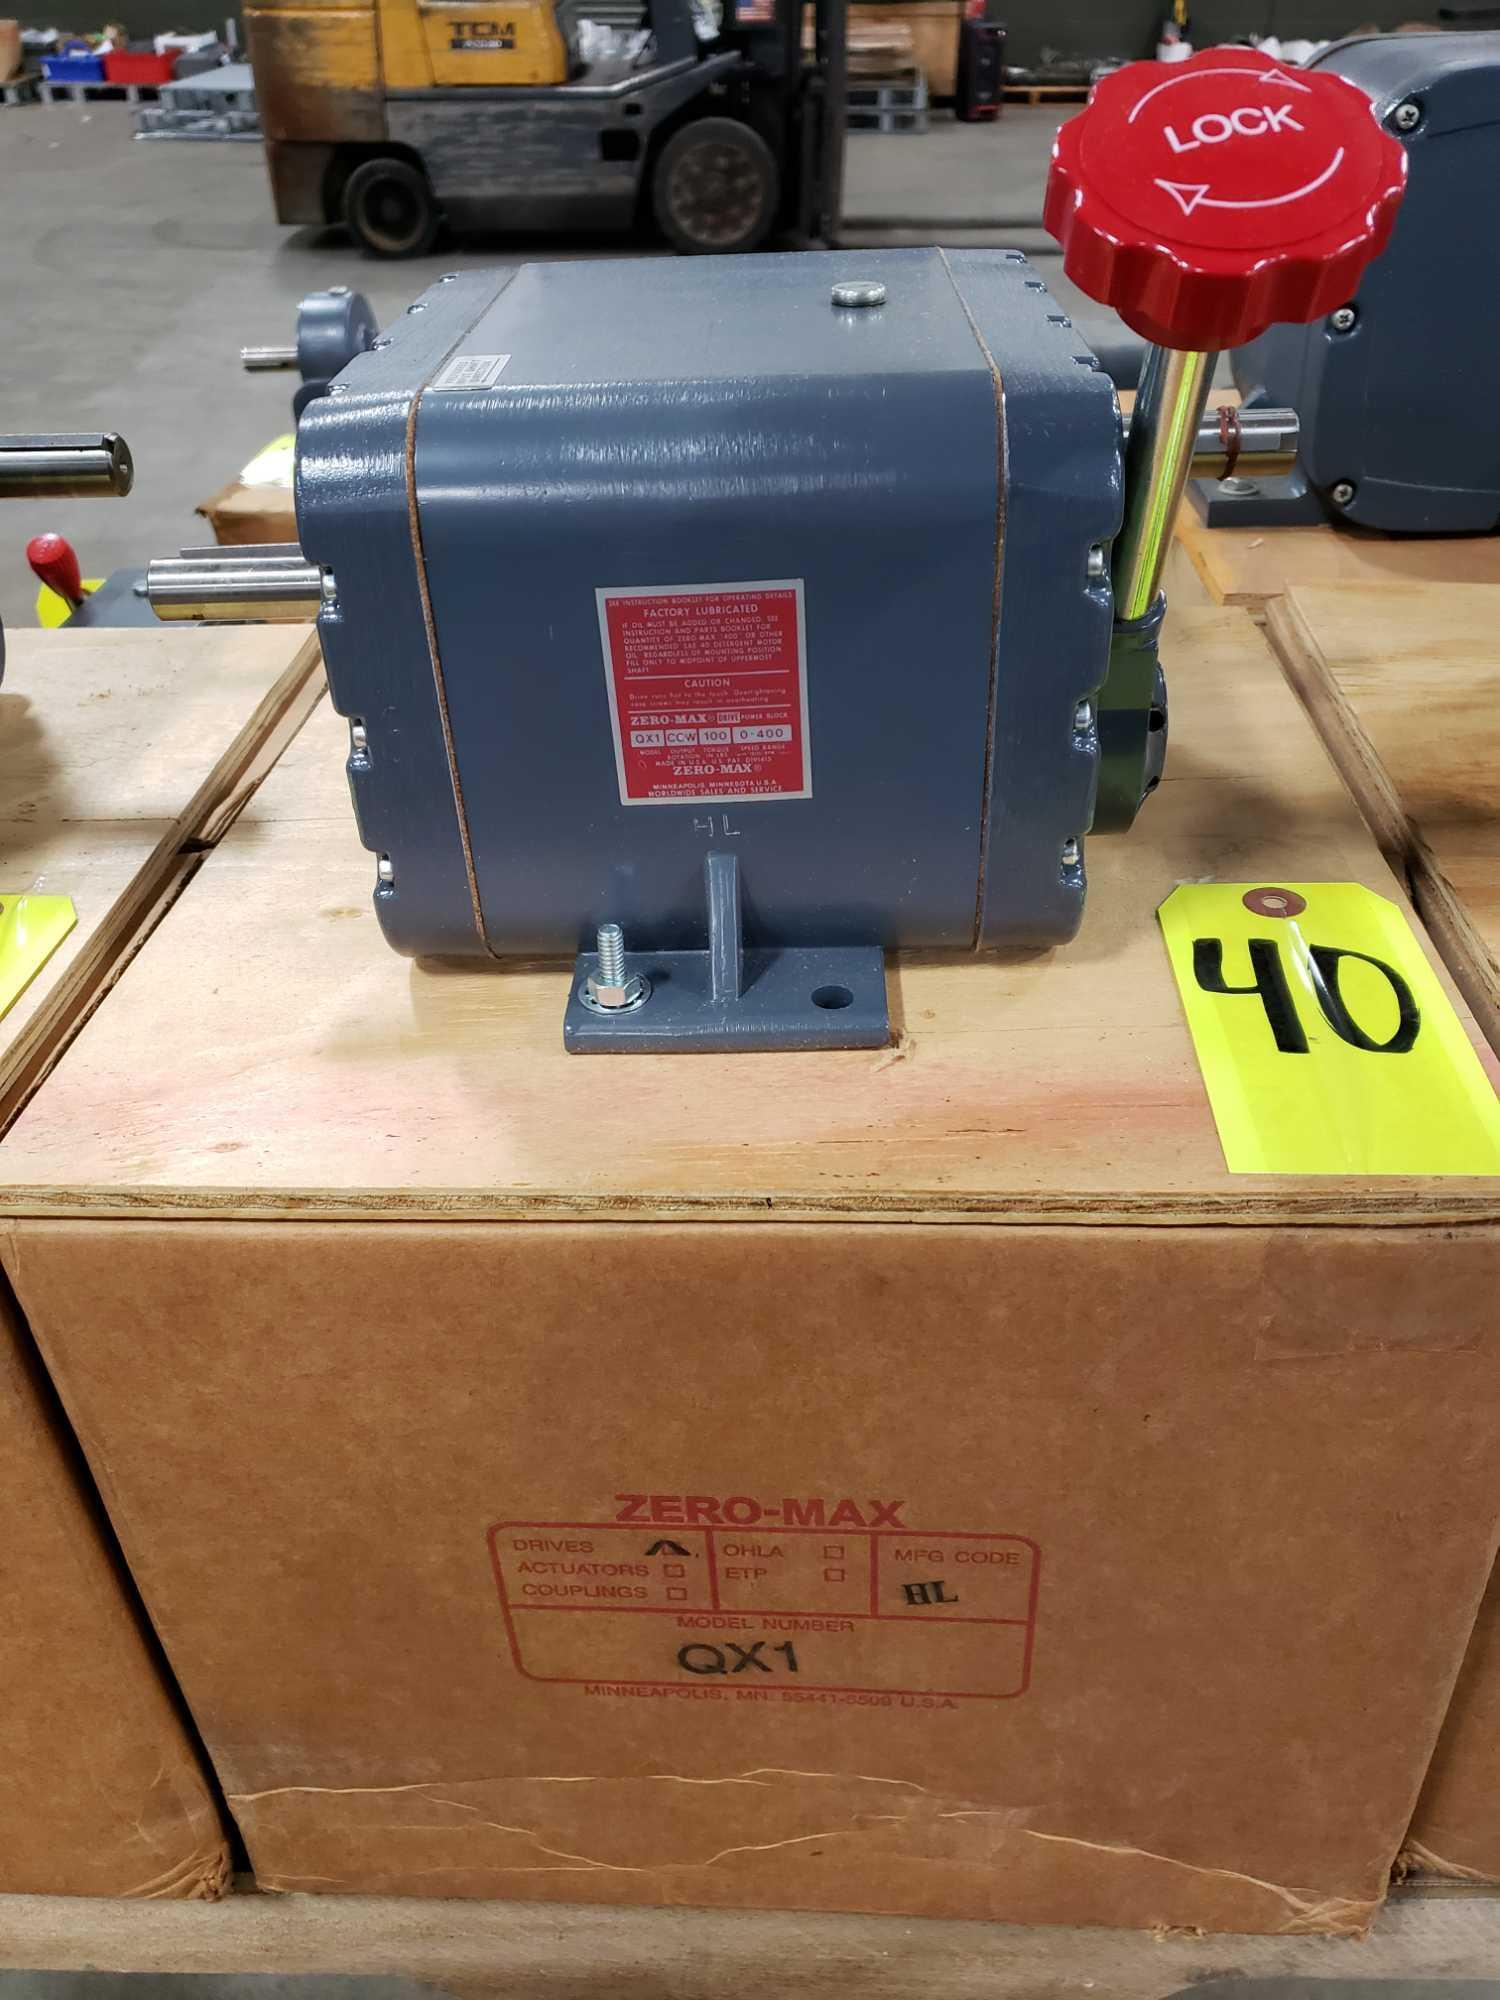 Zero-max drive power block model QX1 CCW output rotation, 100lb torque, 0-400 speed range. New.